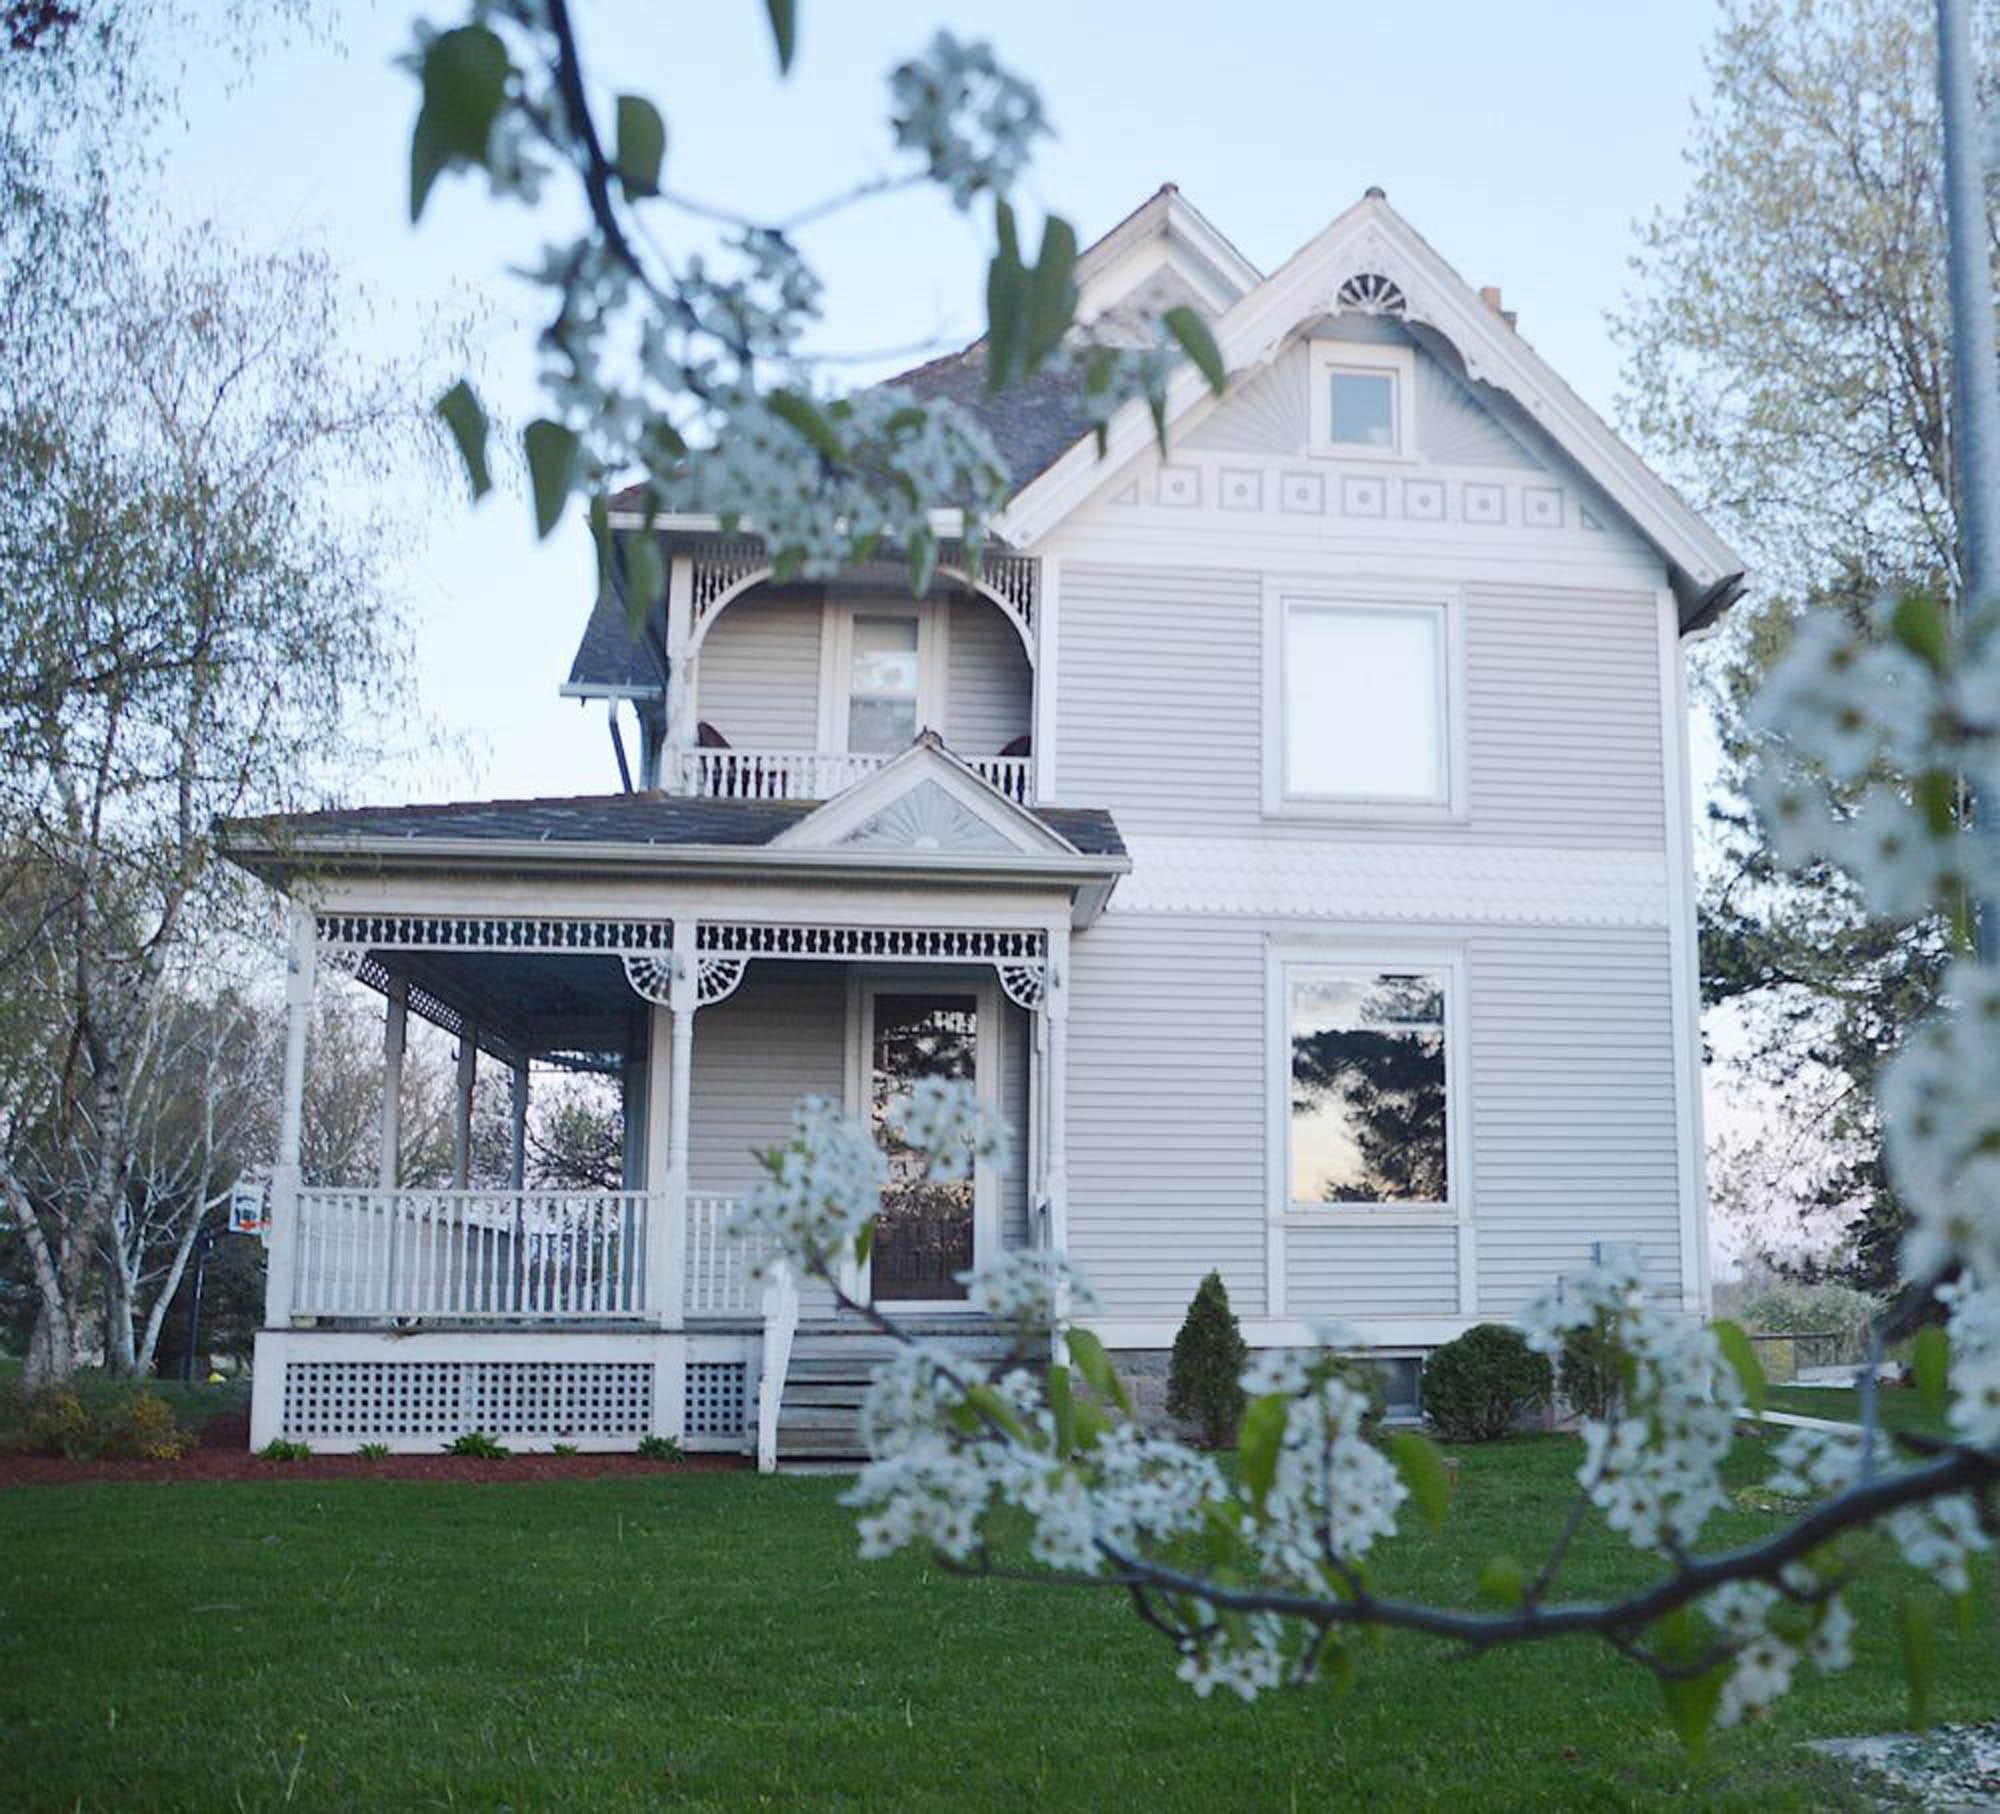 The Victorian Farmhouse